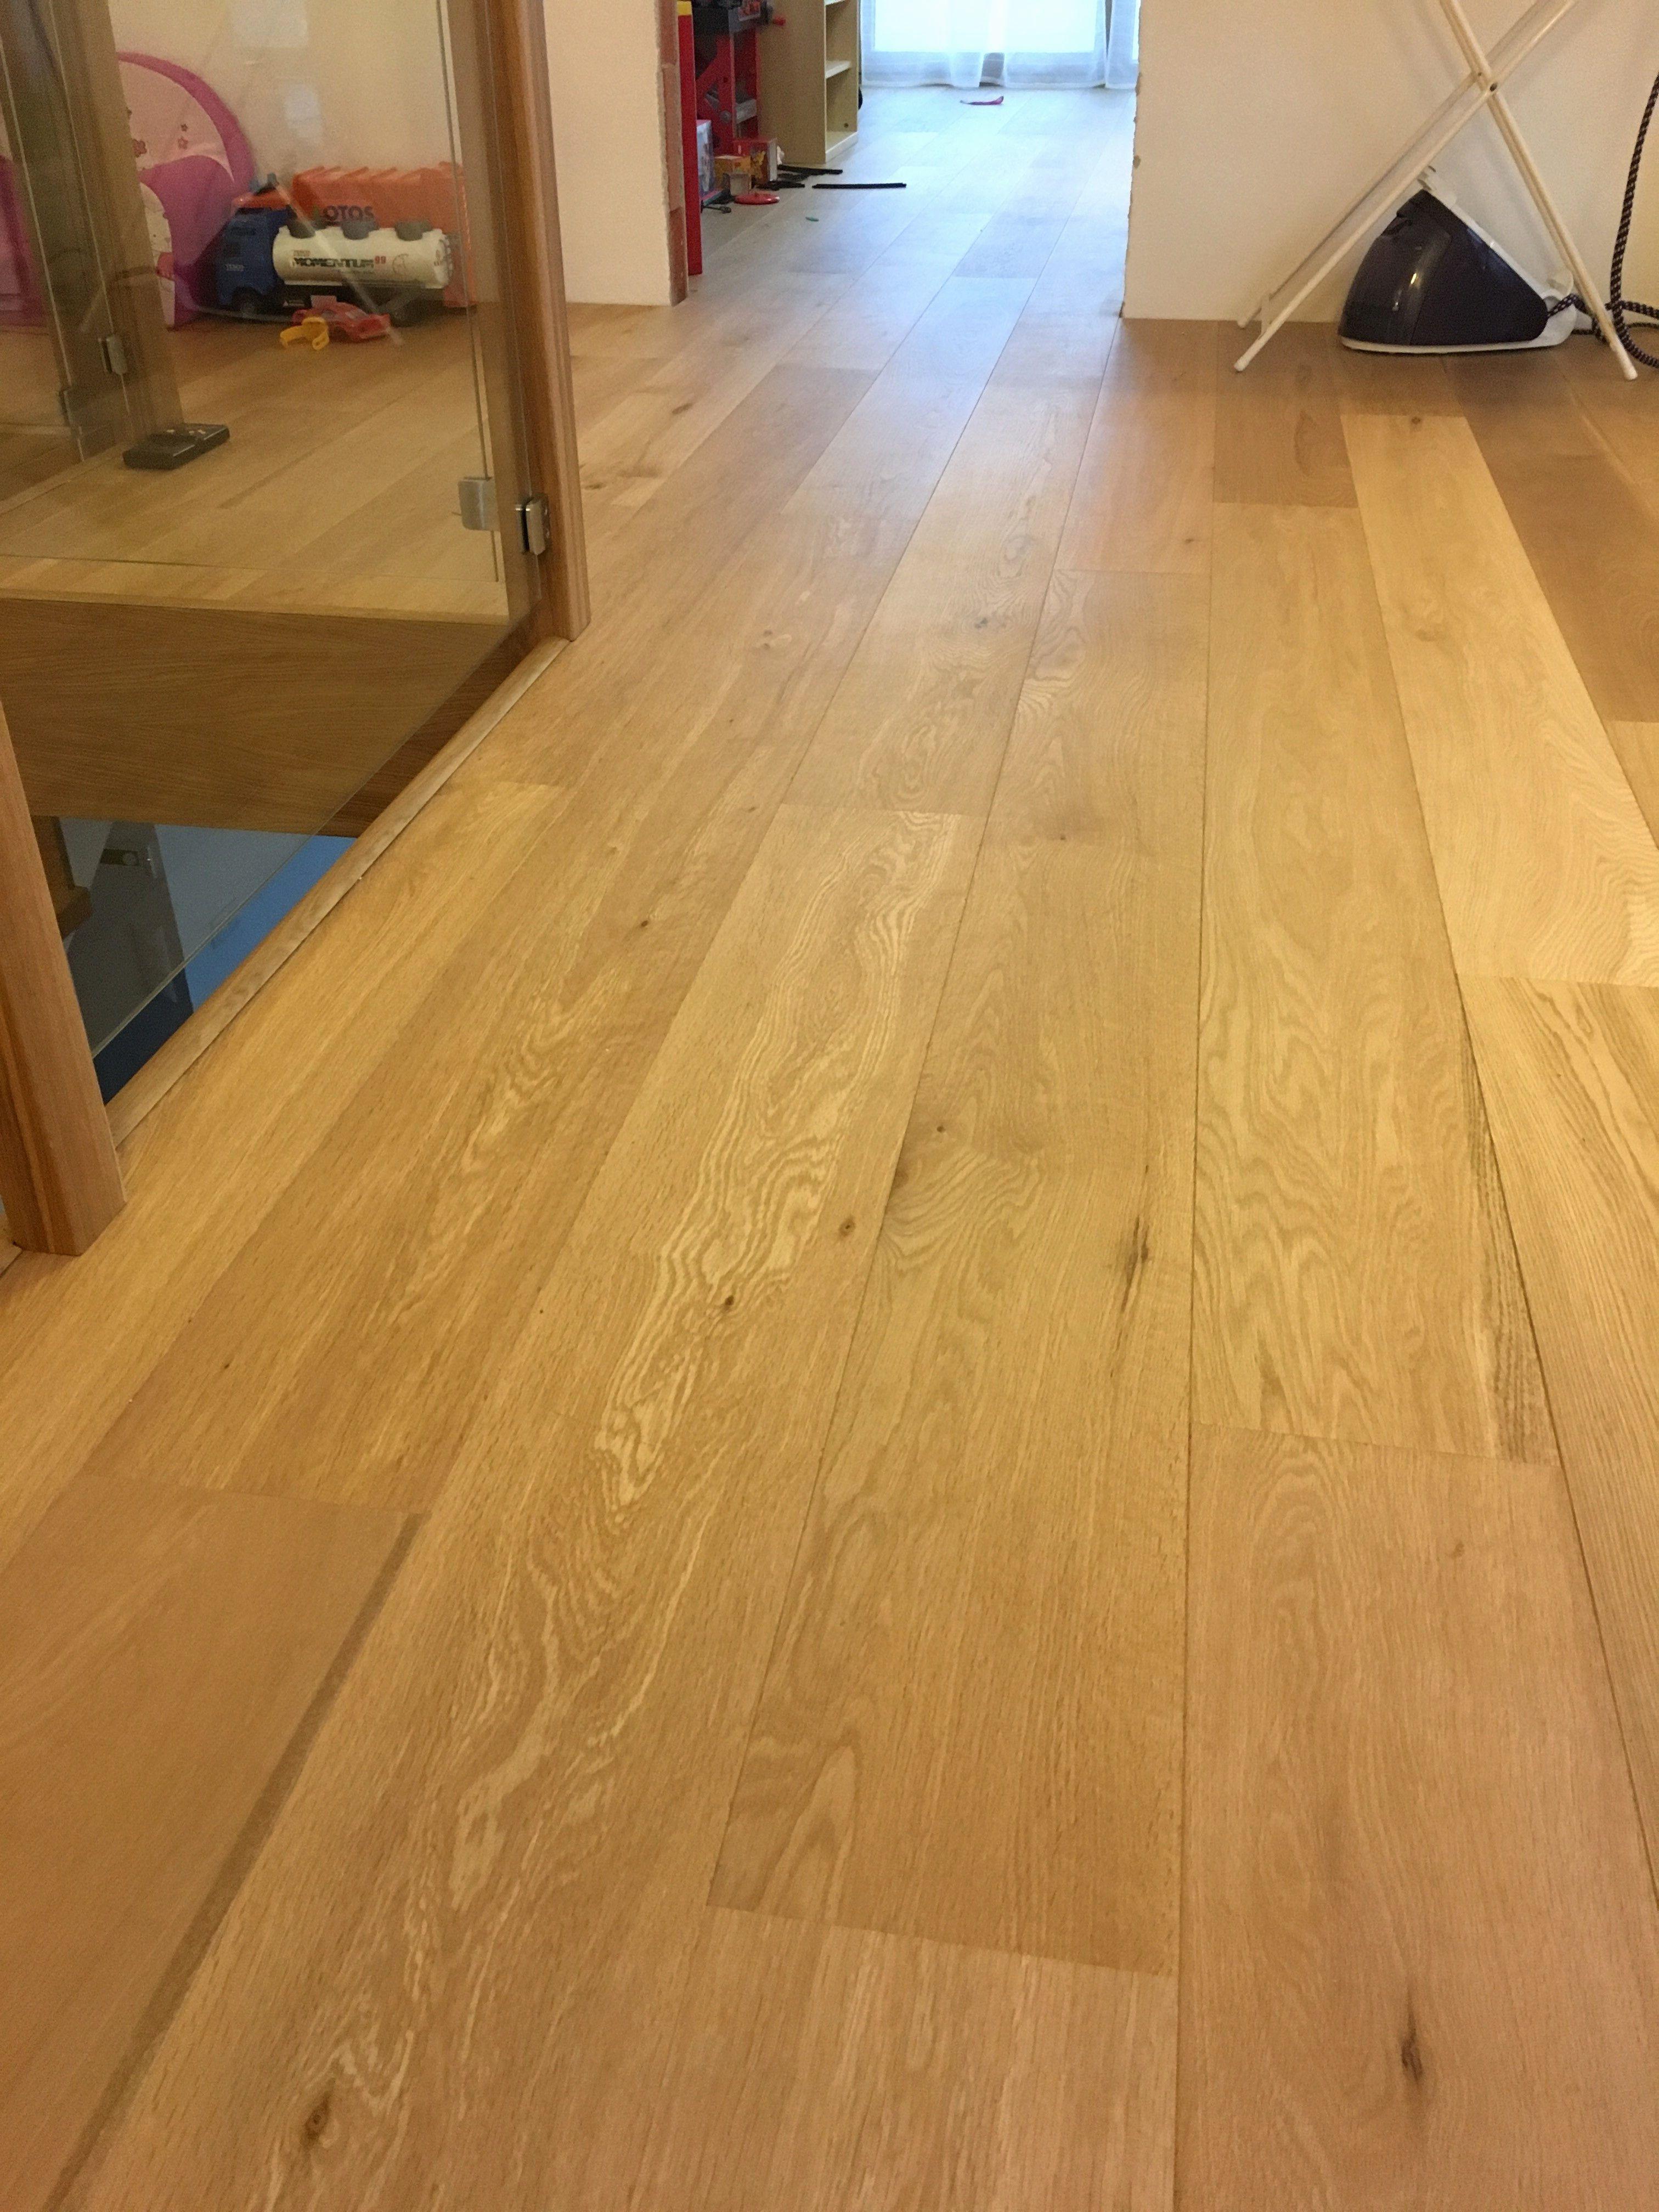 hardwood flooring labor cost of wood floor installation cost floor plan ideas inside wood floor installation cost 40 difference between laminate and hardwood flooring ideas